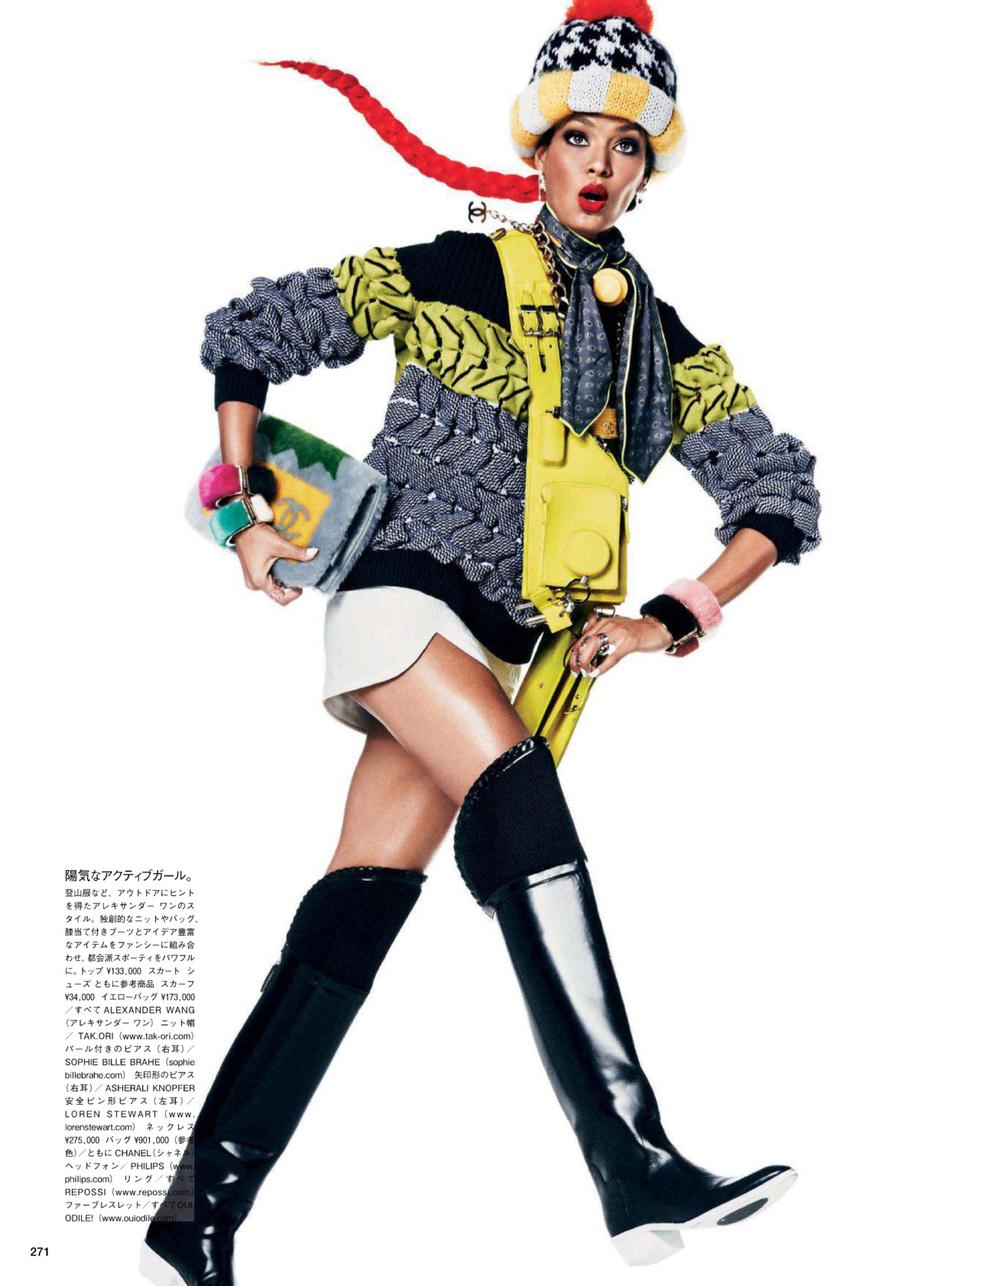 Giampaolo-Sgura-Joan-Smalls-Vogue-Japan-December-2014-6.jpg